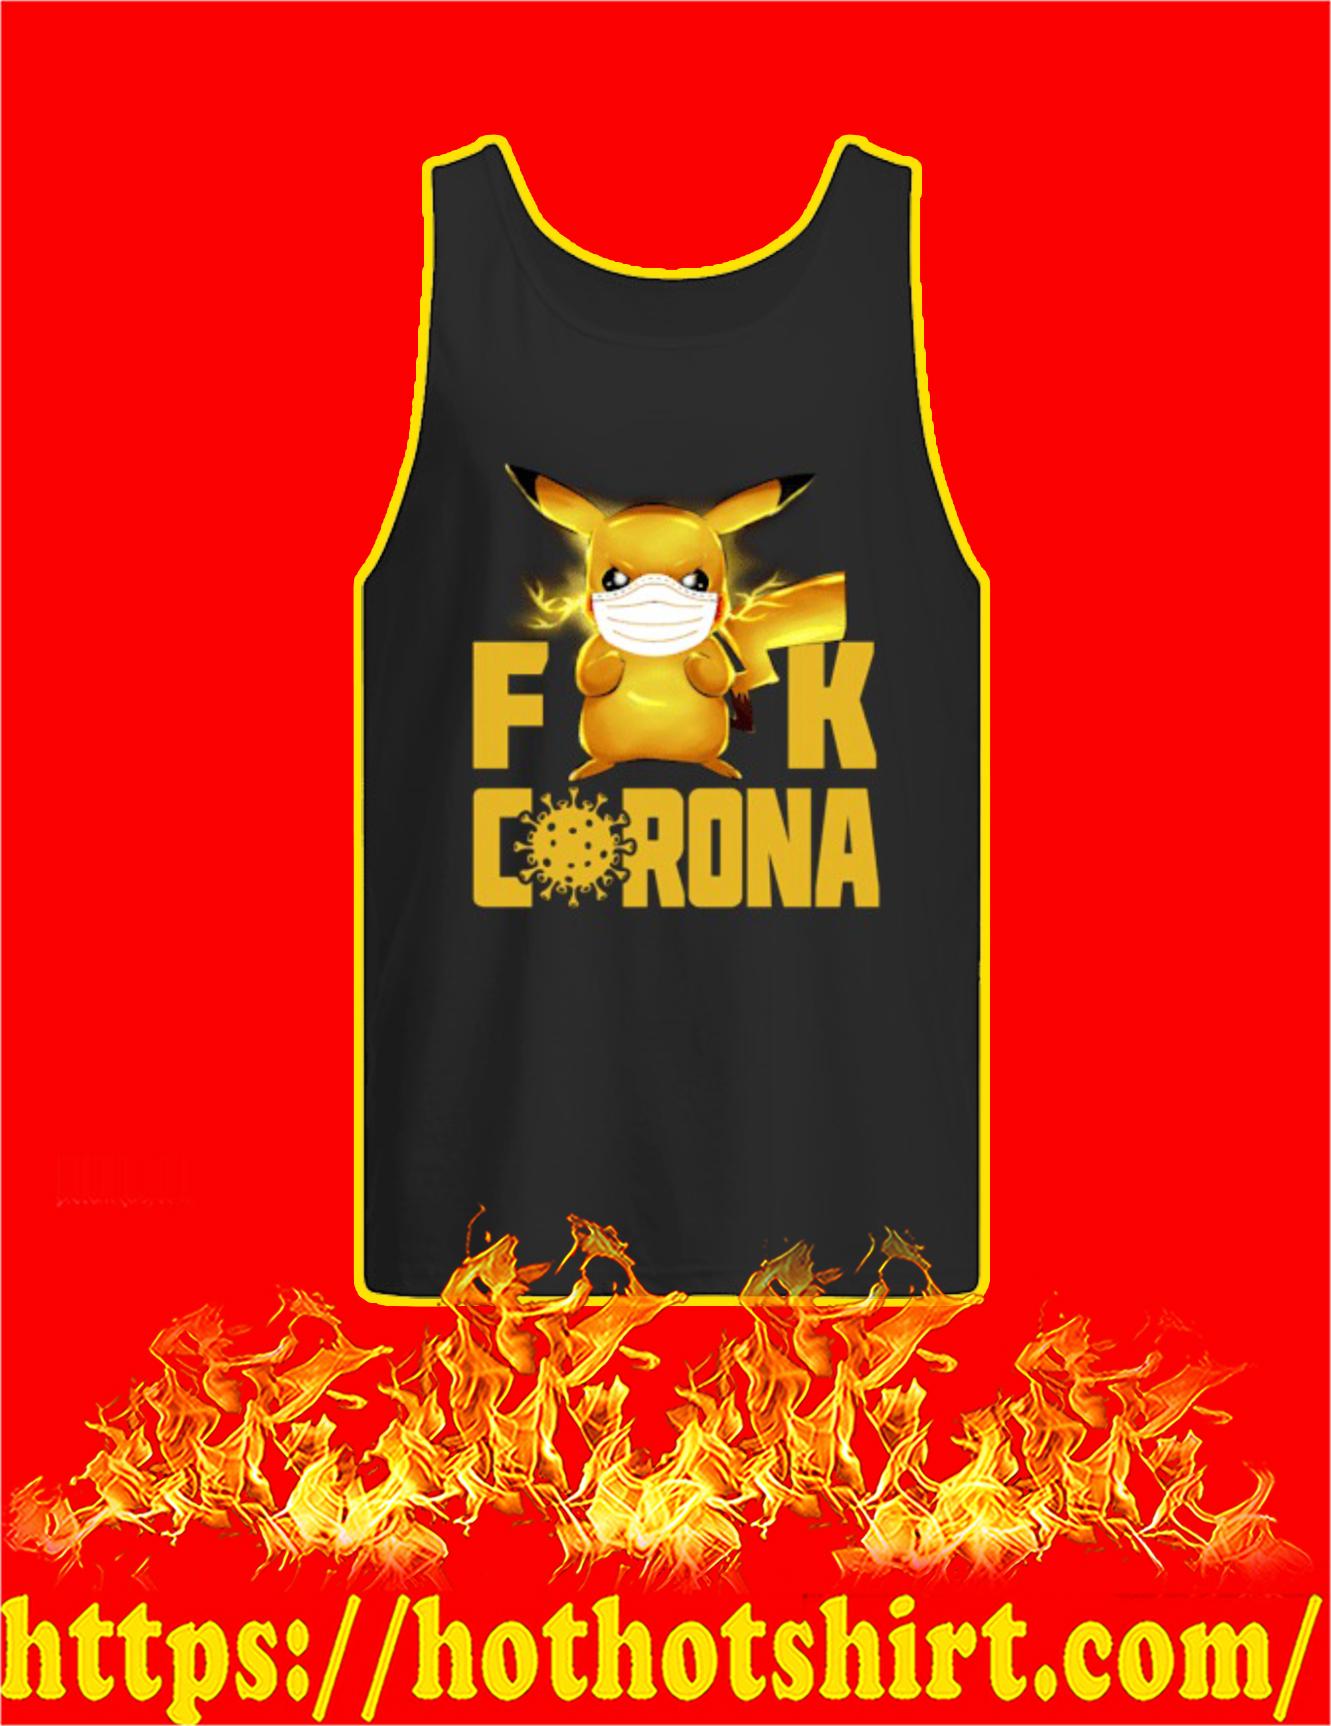 Pikachu fuck corona 2020 Tank Top